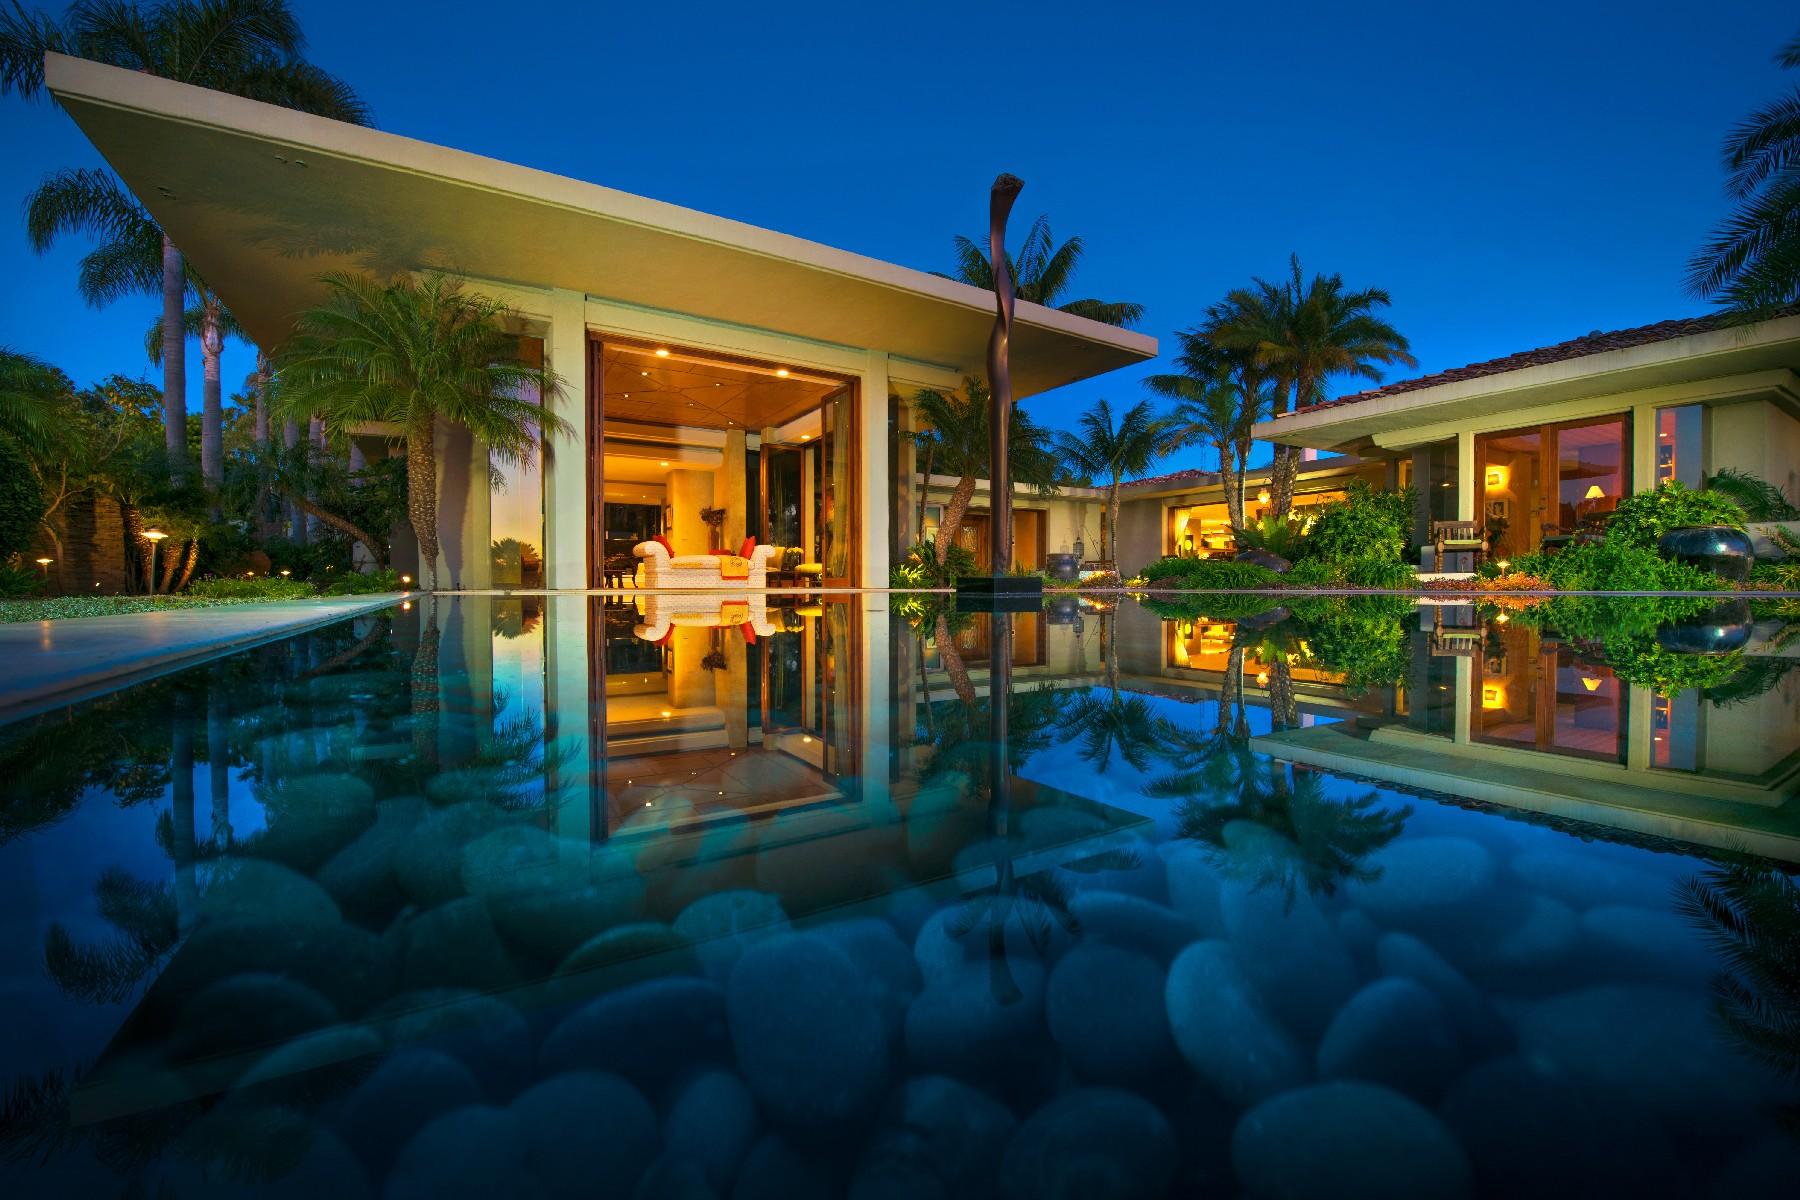 Single Family Home for Sale at 5979 Rancho Diegueno Rancho Santa Fe, California, 92067 United States